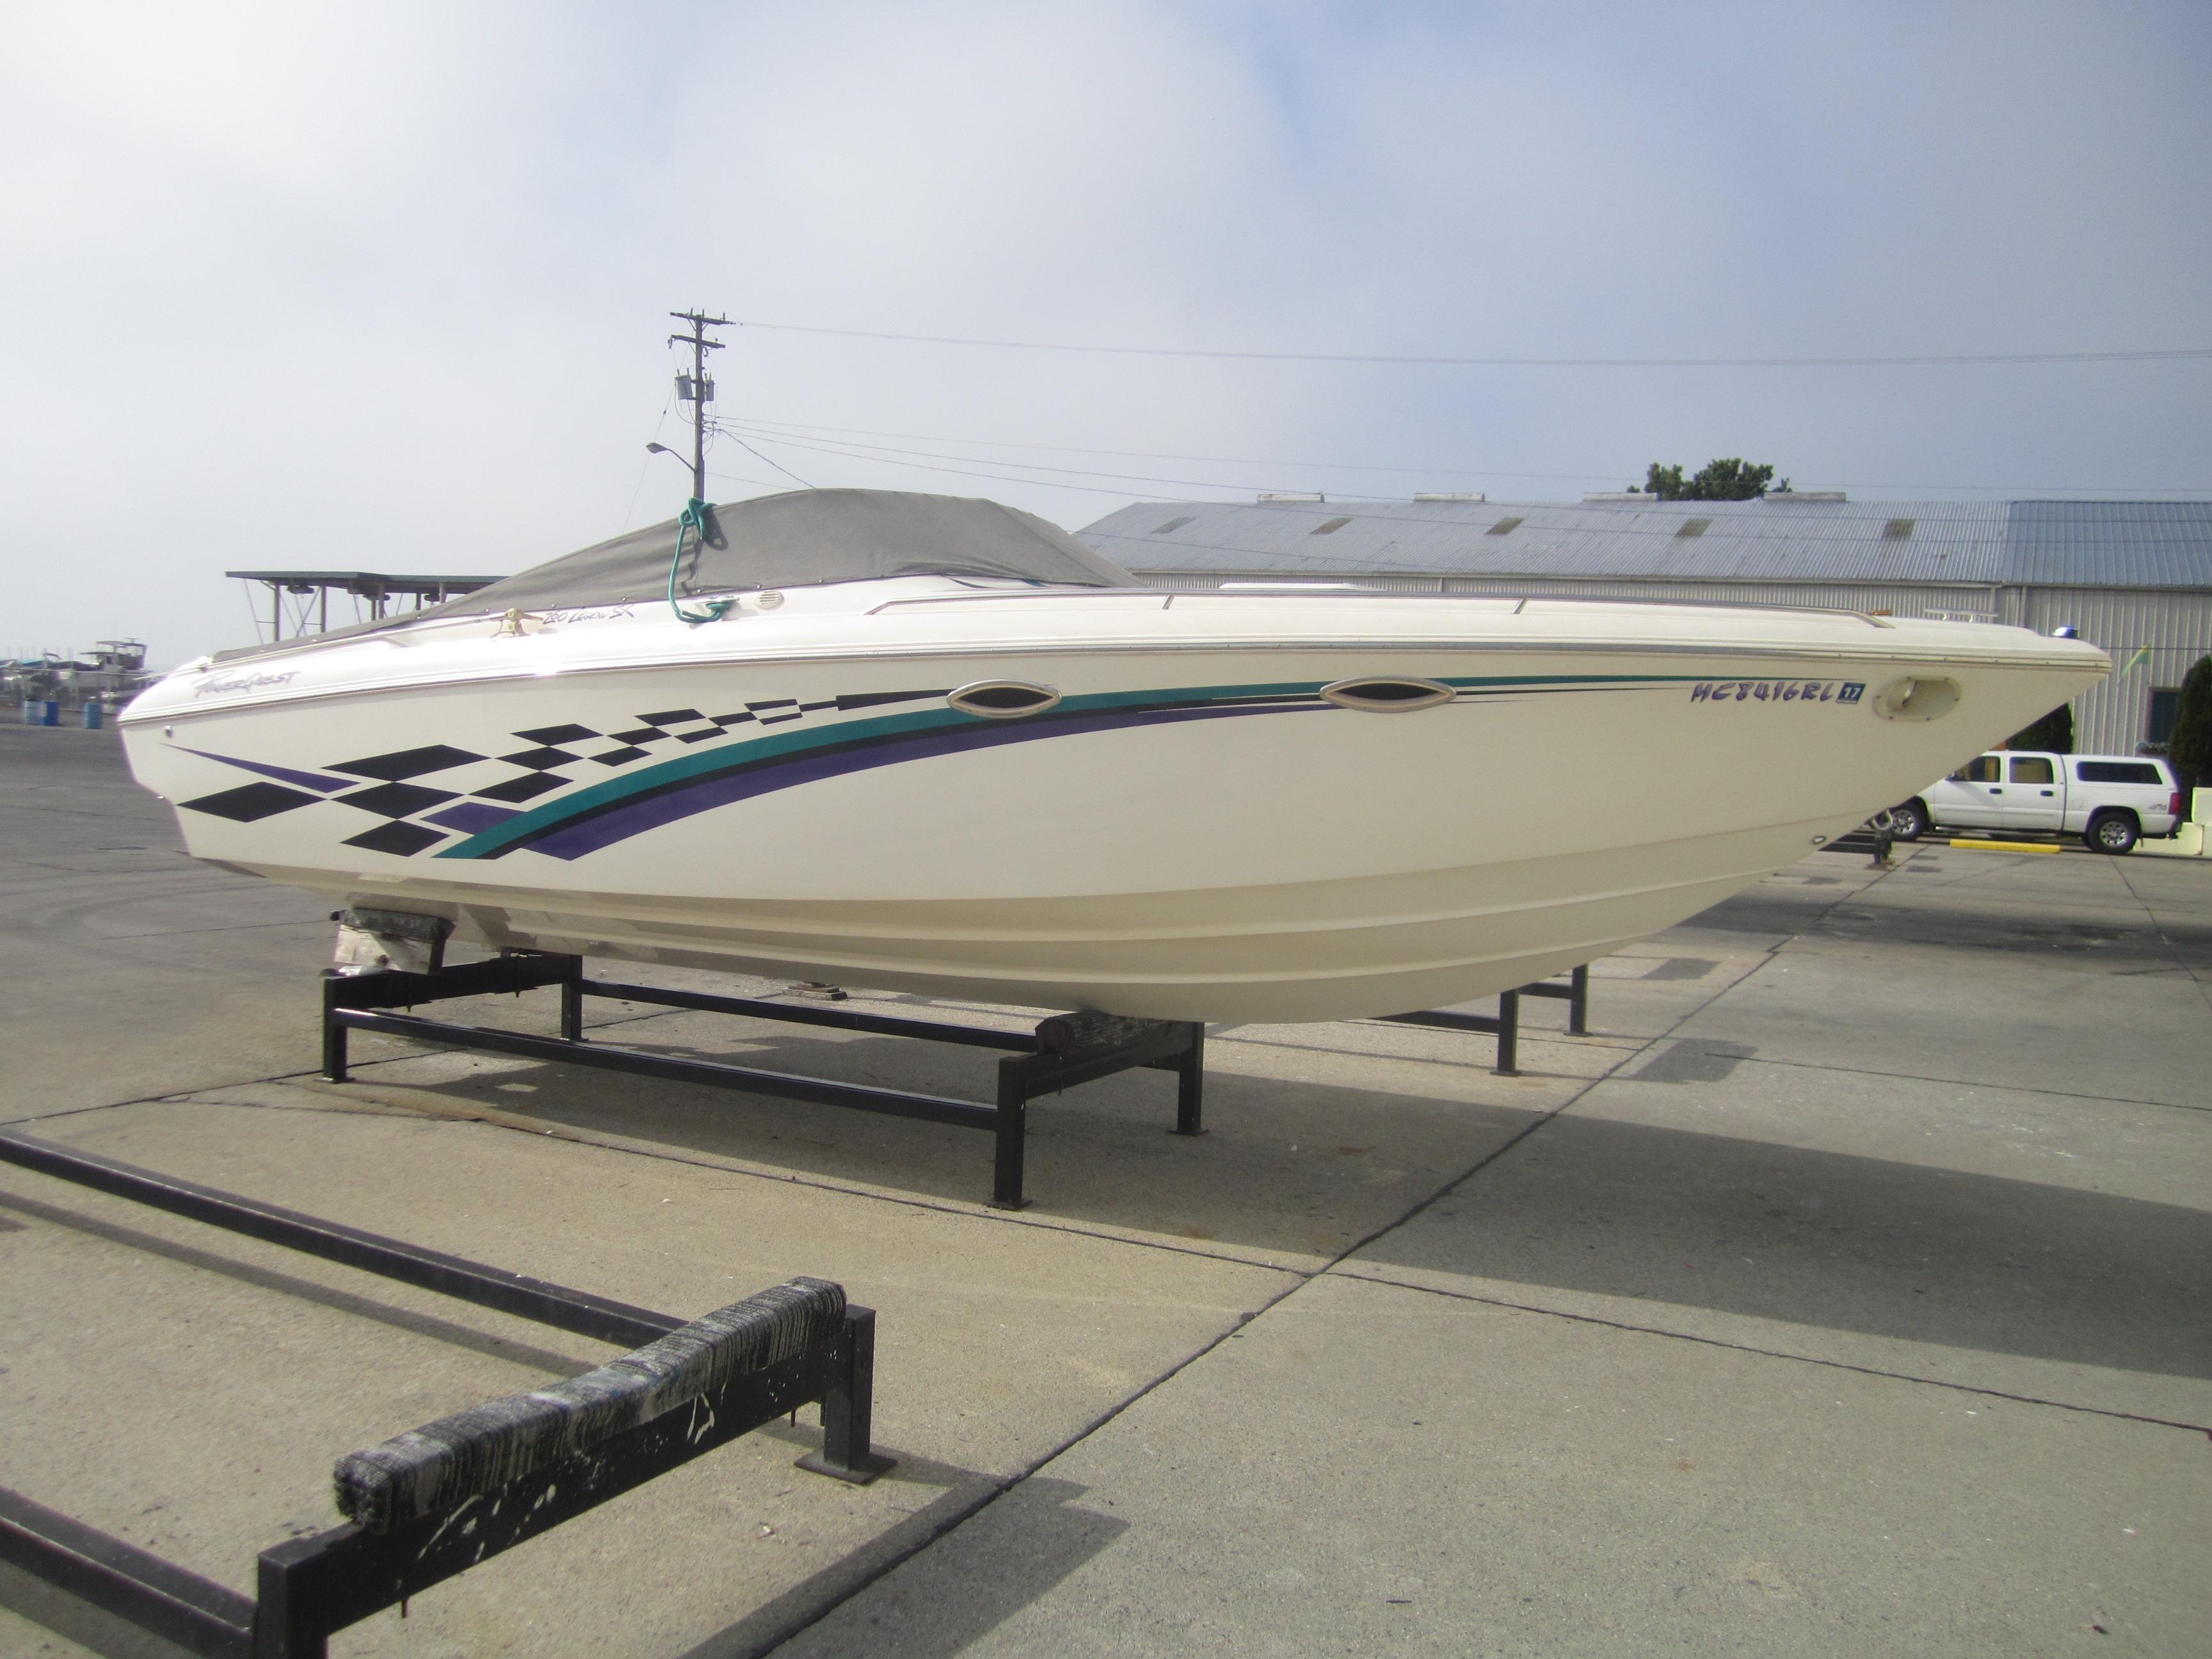 1998 Powerquest 260 Legend SX Power Boat For Sale Www